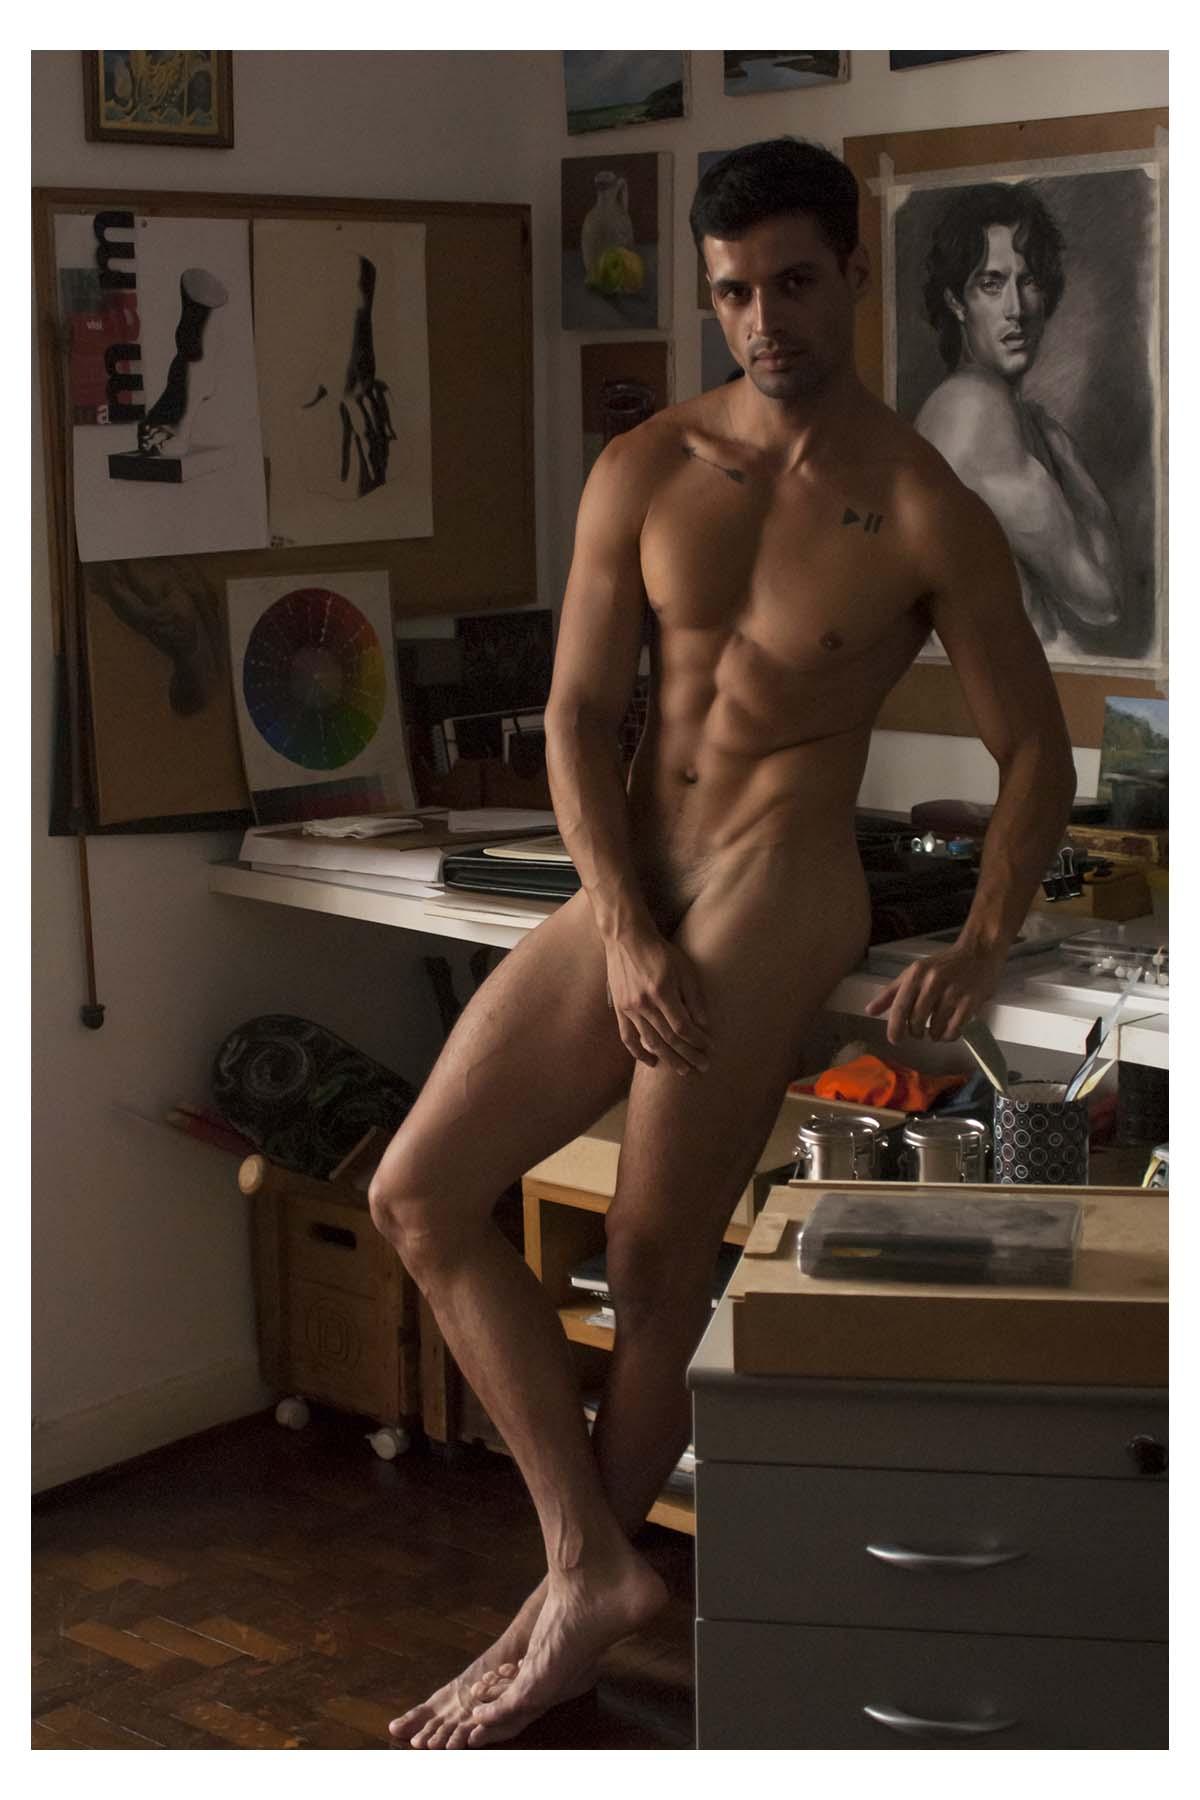 Jonathan Rosa by Antonio Bezerra (Didio) for Brazilian Male Model